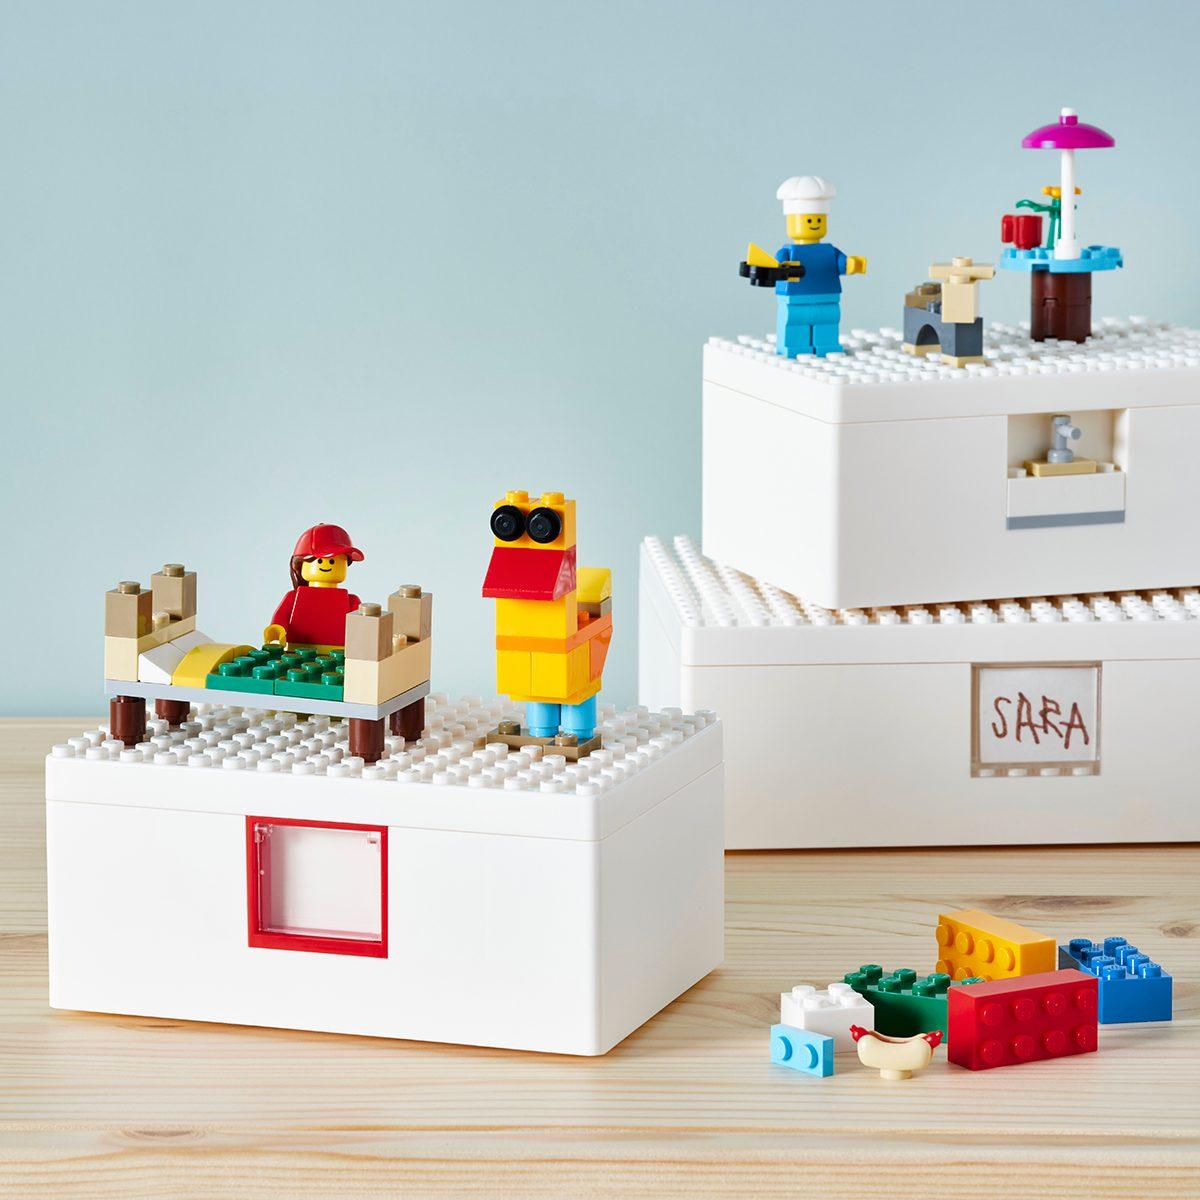 IKEA LEGO Bygglek Collection